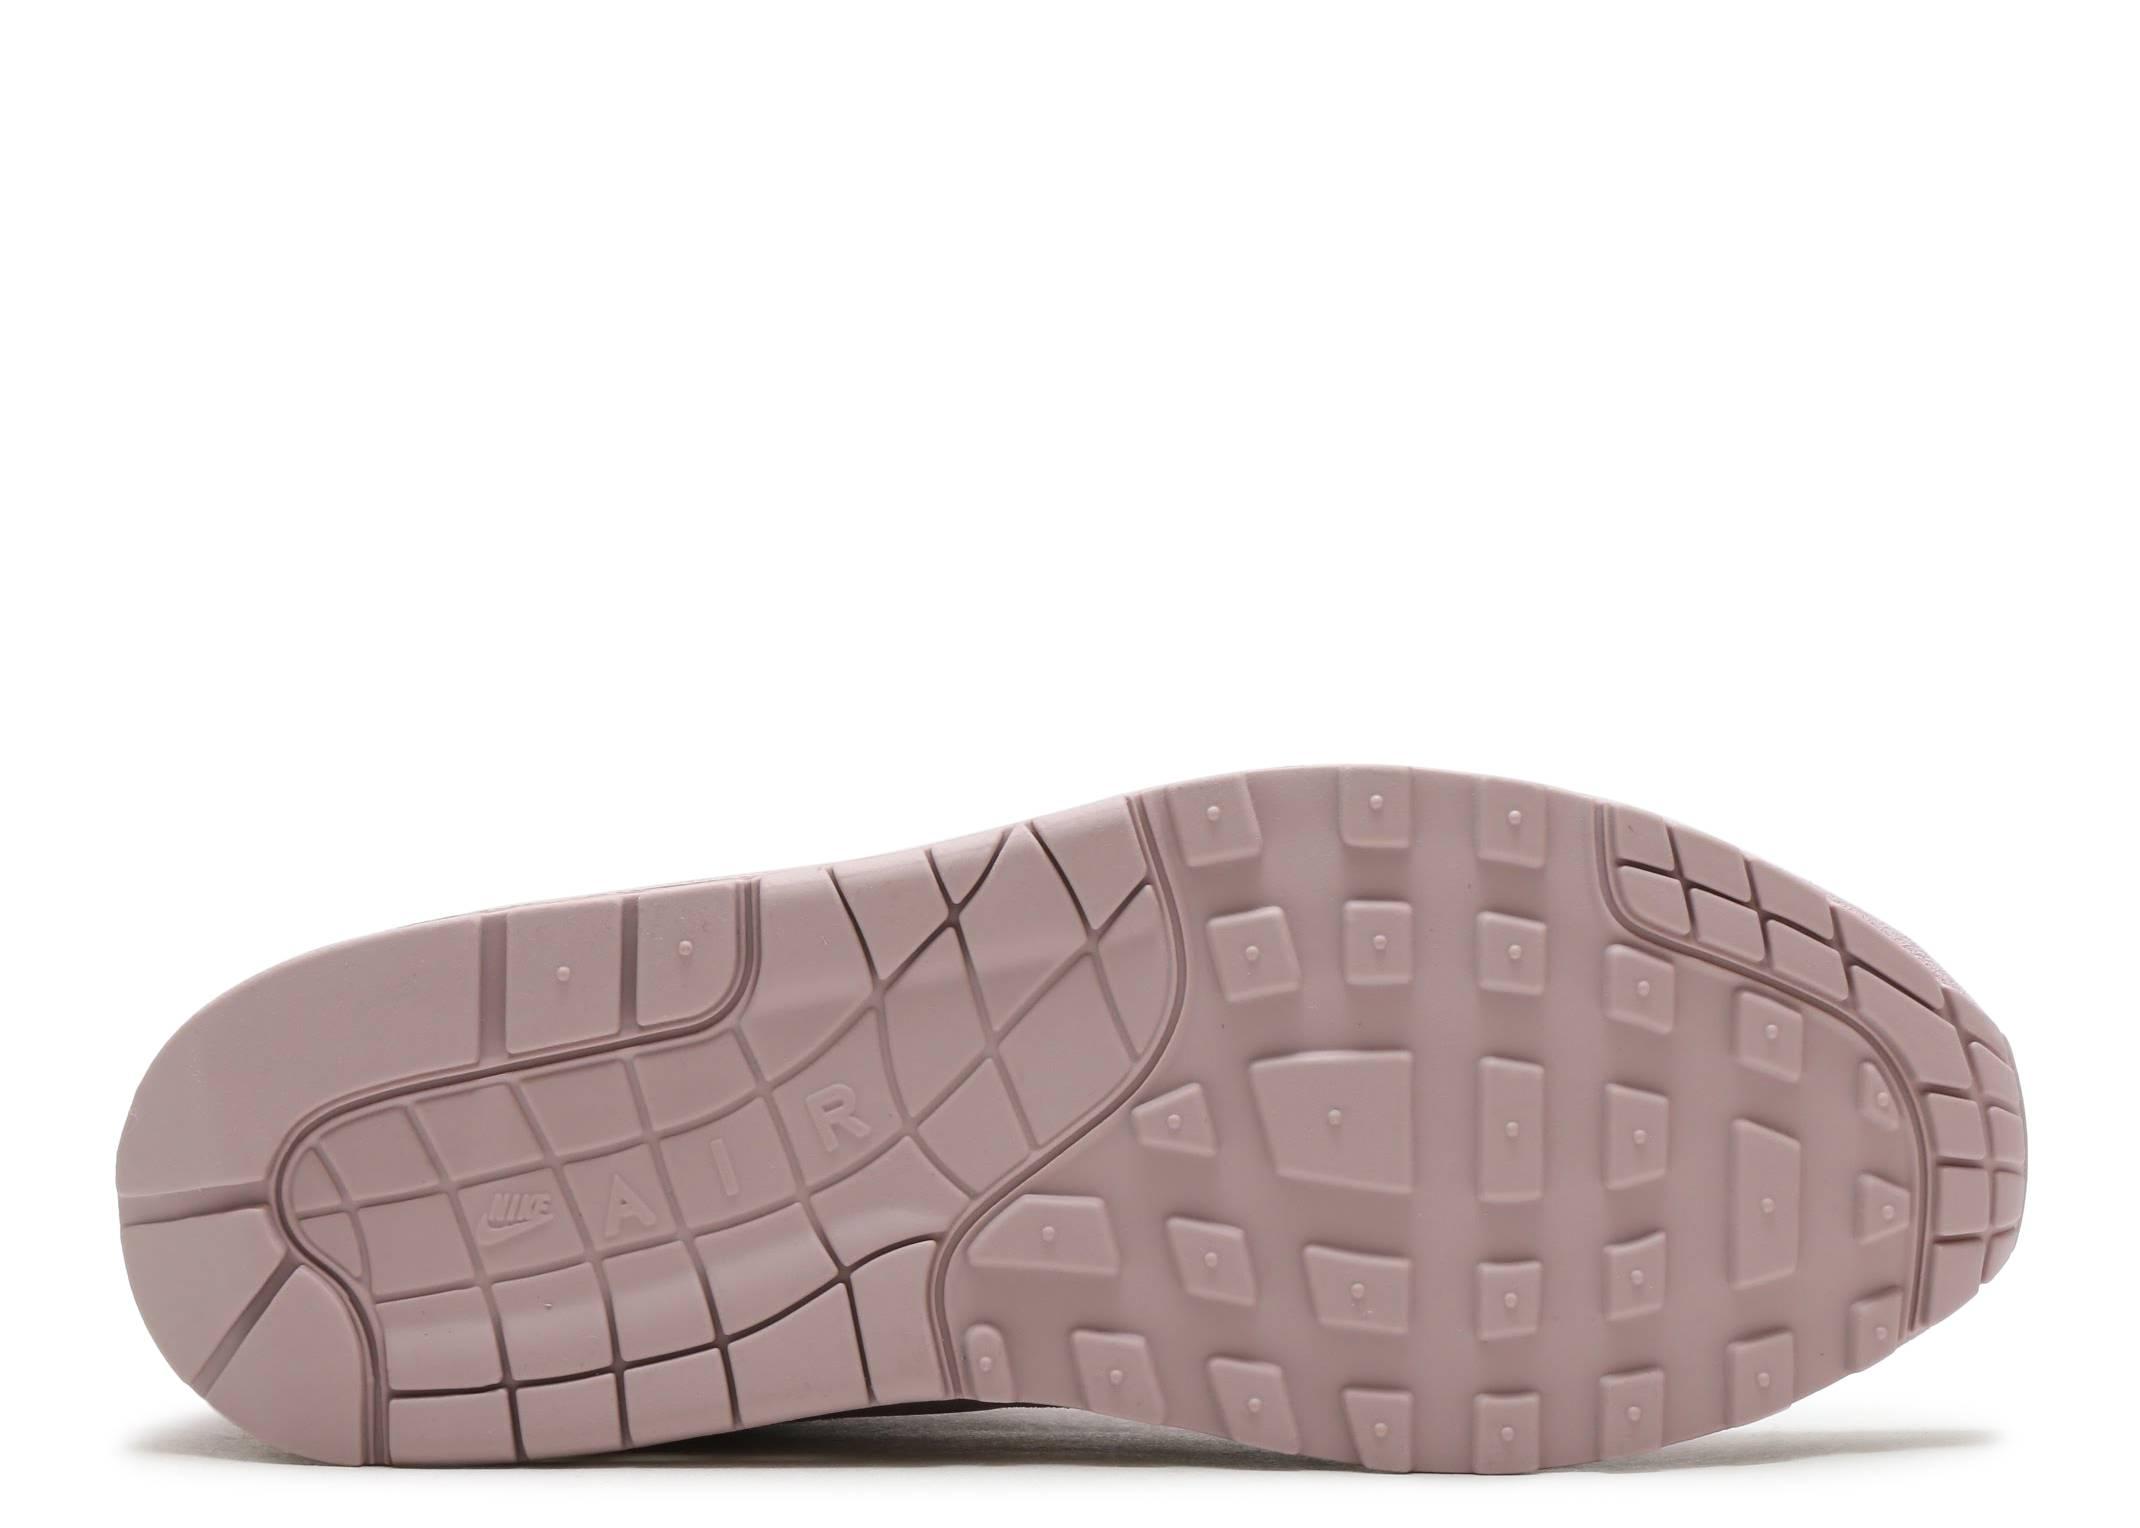 new product 9448c f6a46 AIR MAX 1 PREMIUM SC - Nike - 918354 601 - particle rosemetallic gold-desert  sand  Flight Club